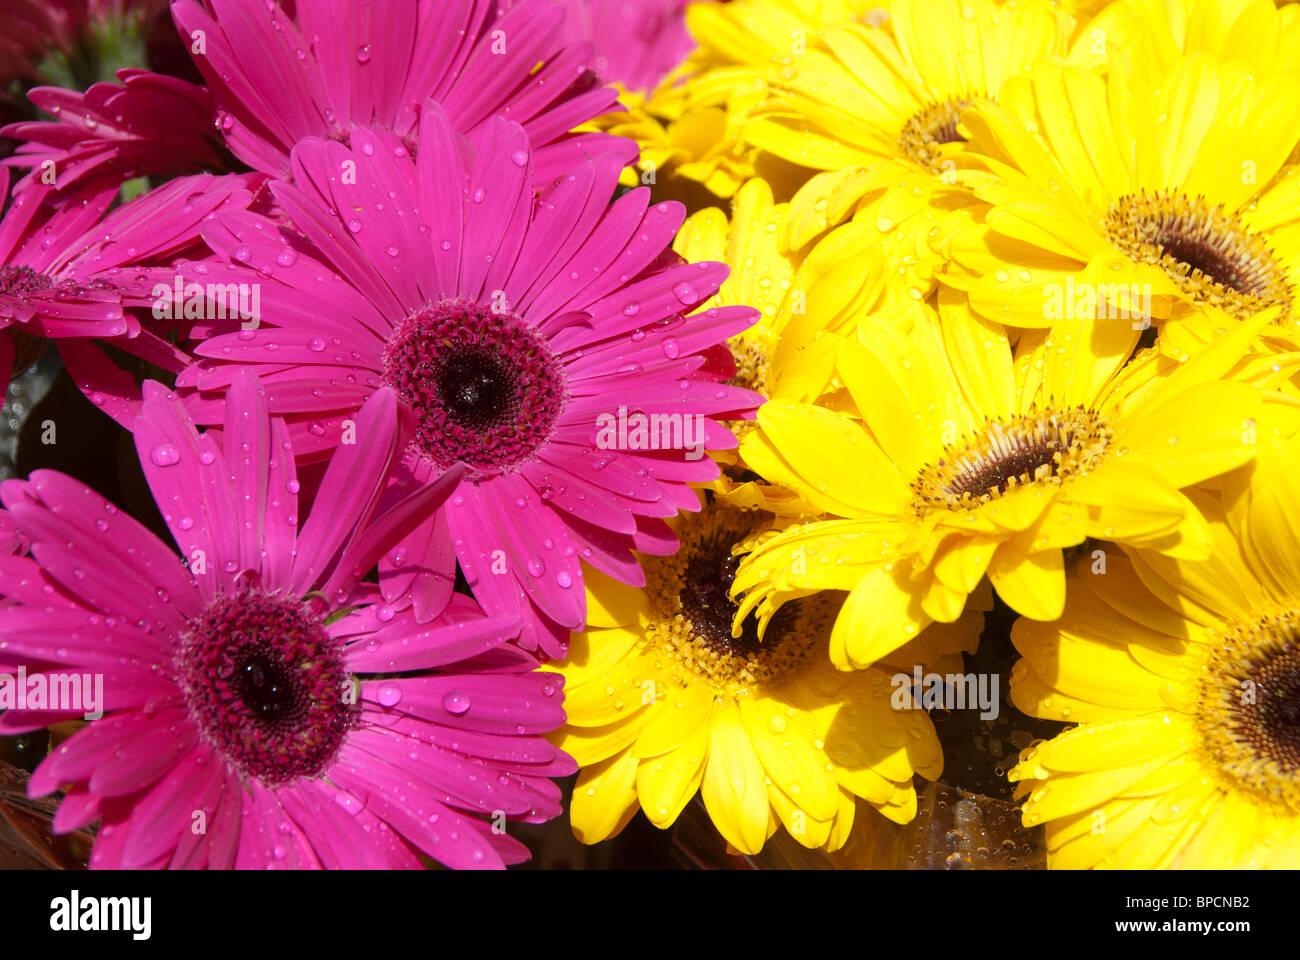 Columbia road, East London . Sunday morning flower market. Yellow and magenta gerberas - Stock Image